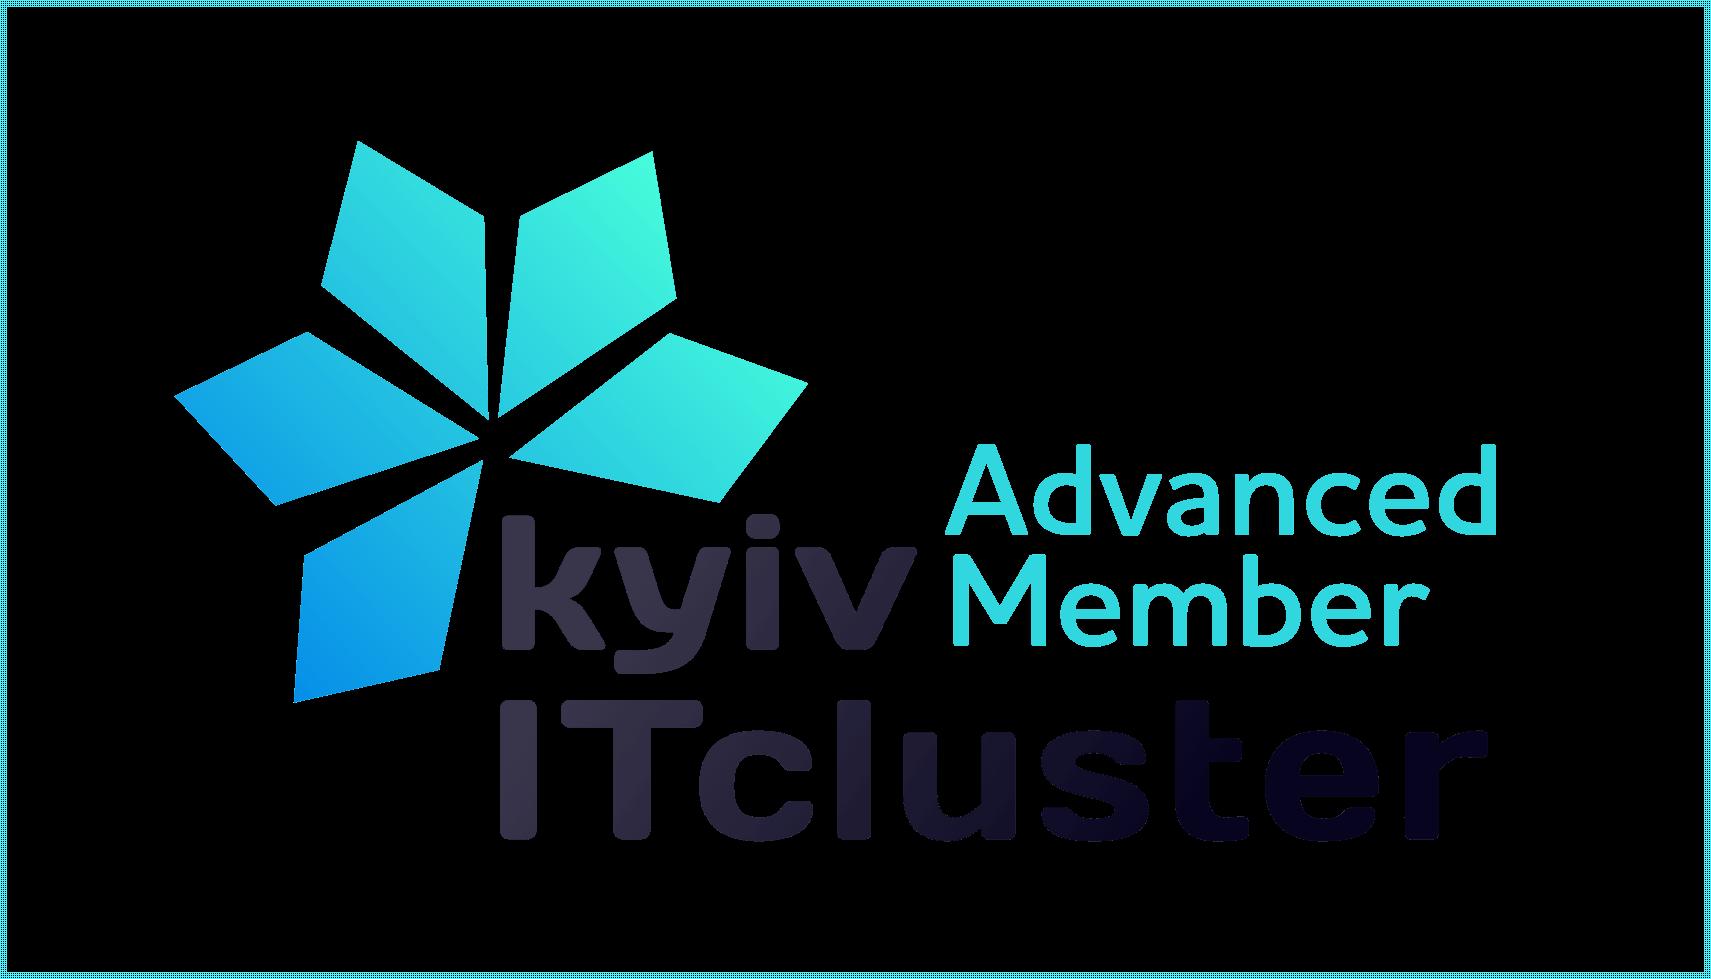 Kyiv IT Cluster